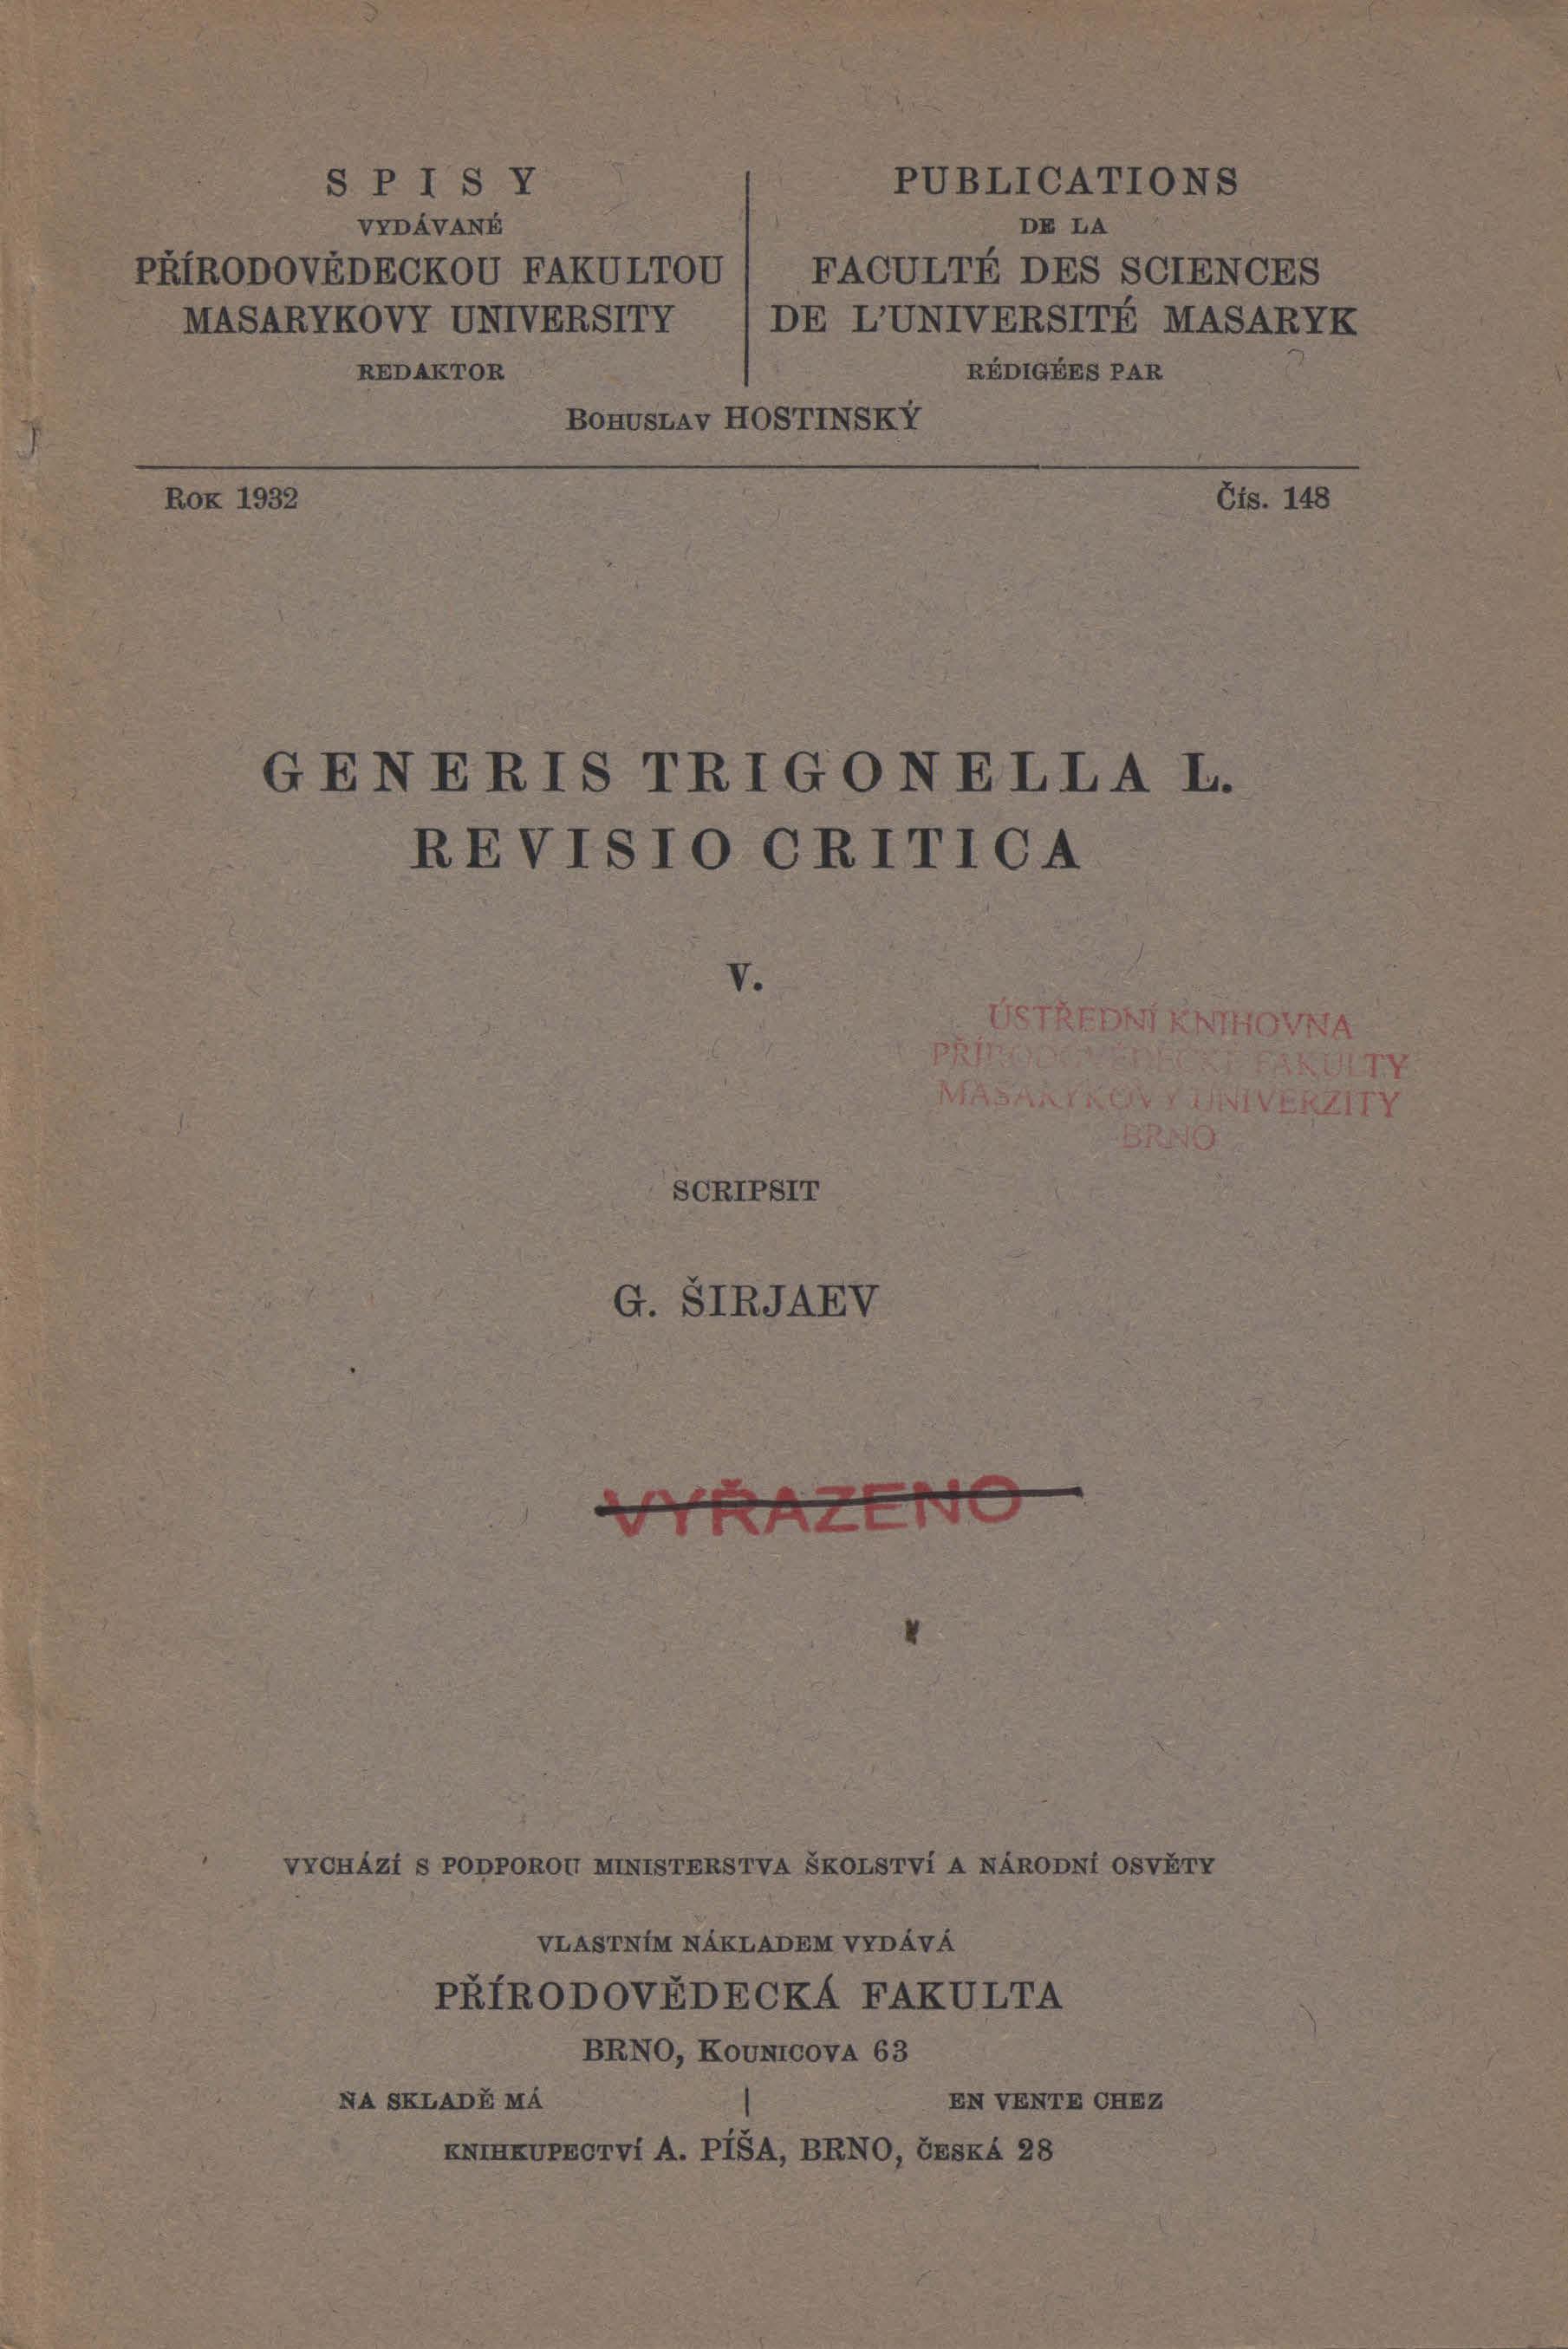 Obálka pro Generis Trigonella L. revisio critica. V.